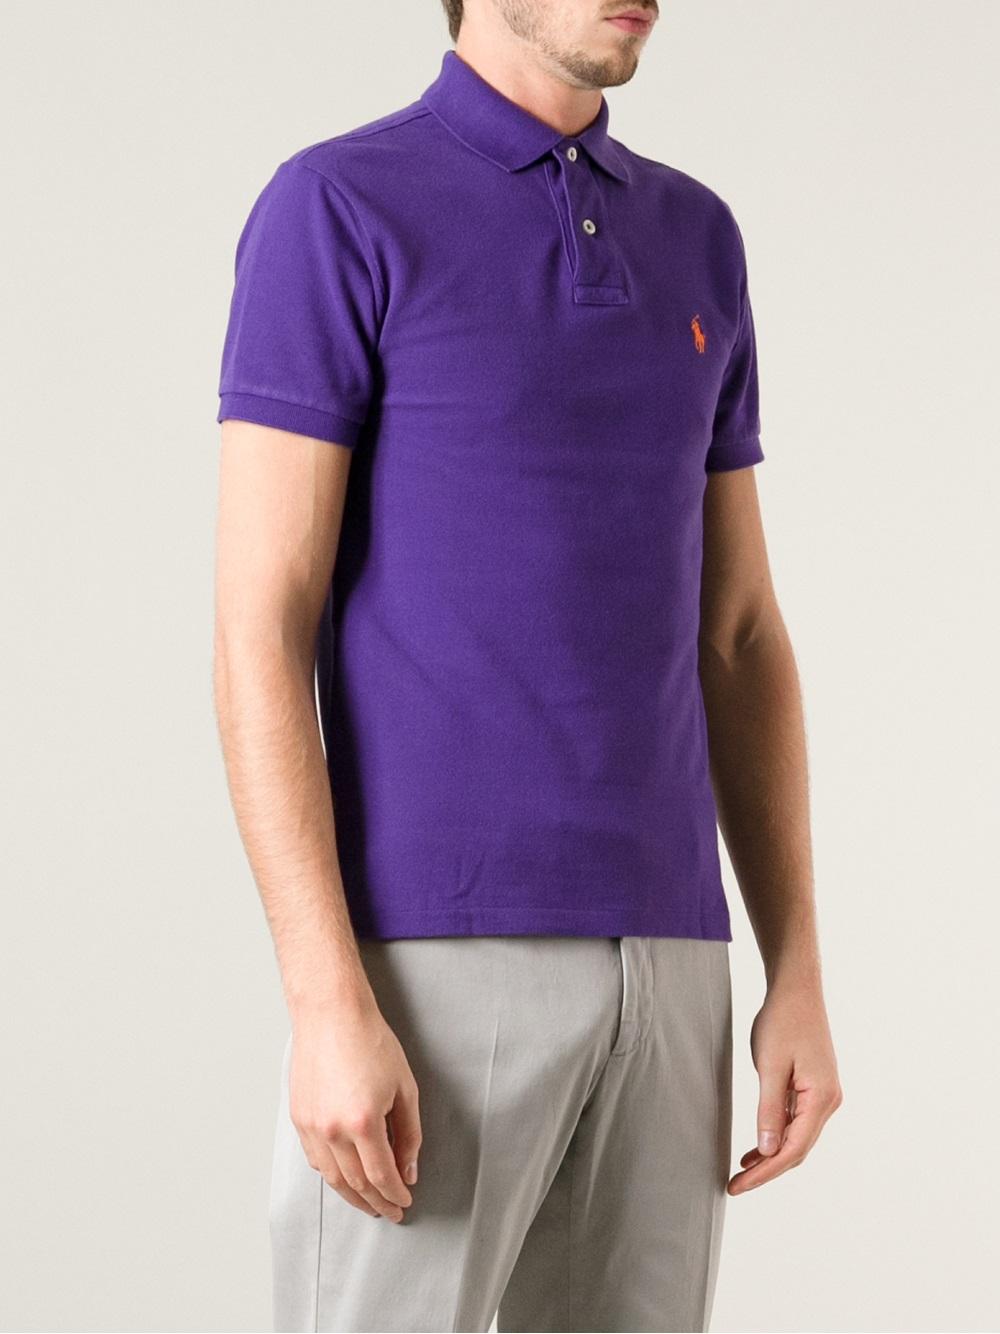 Lyst Polo Ralph Lauren Short Sleeve Polo Shirt In Purple